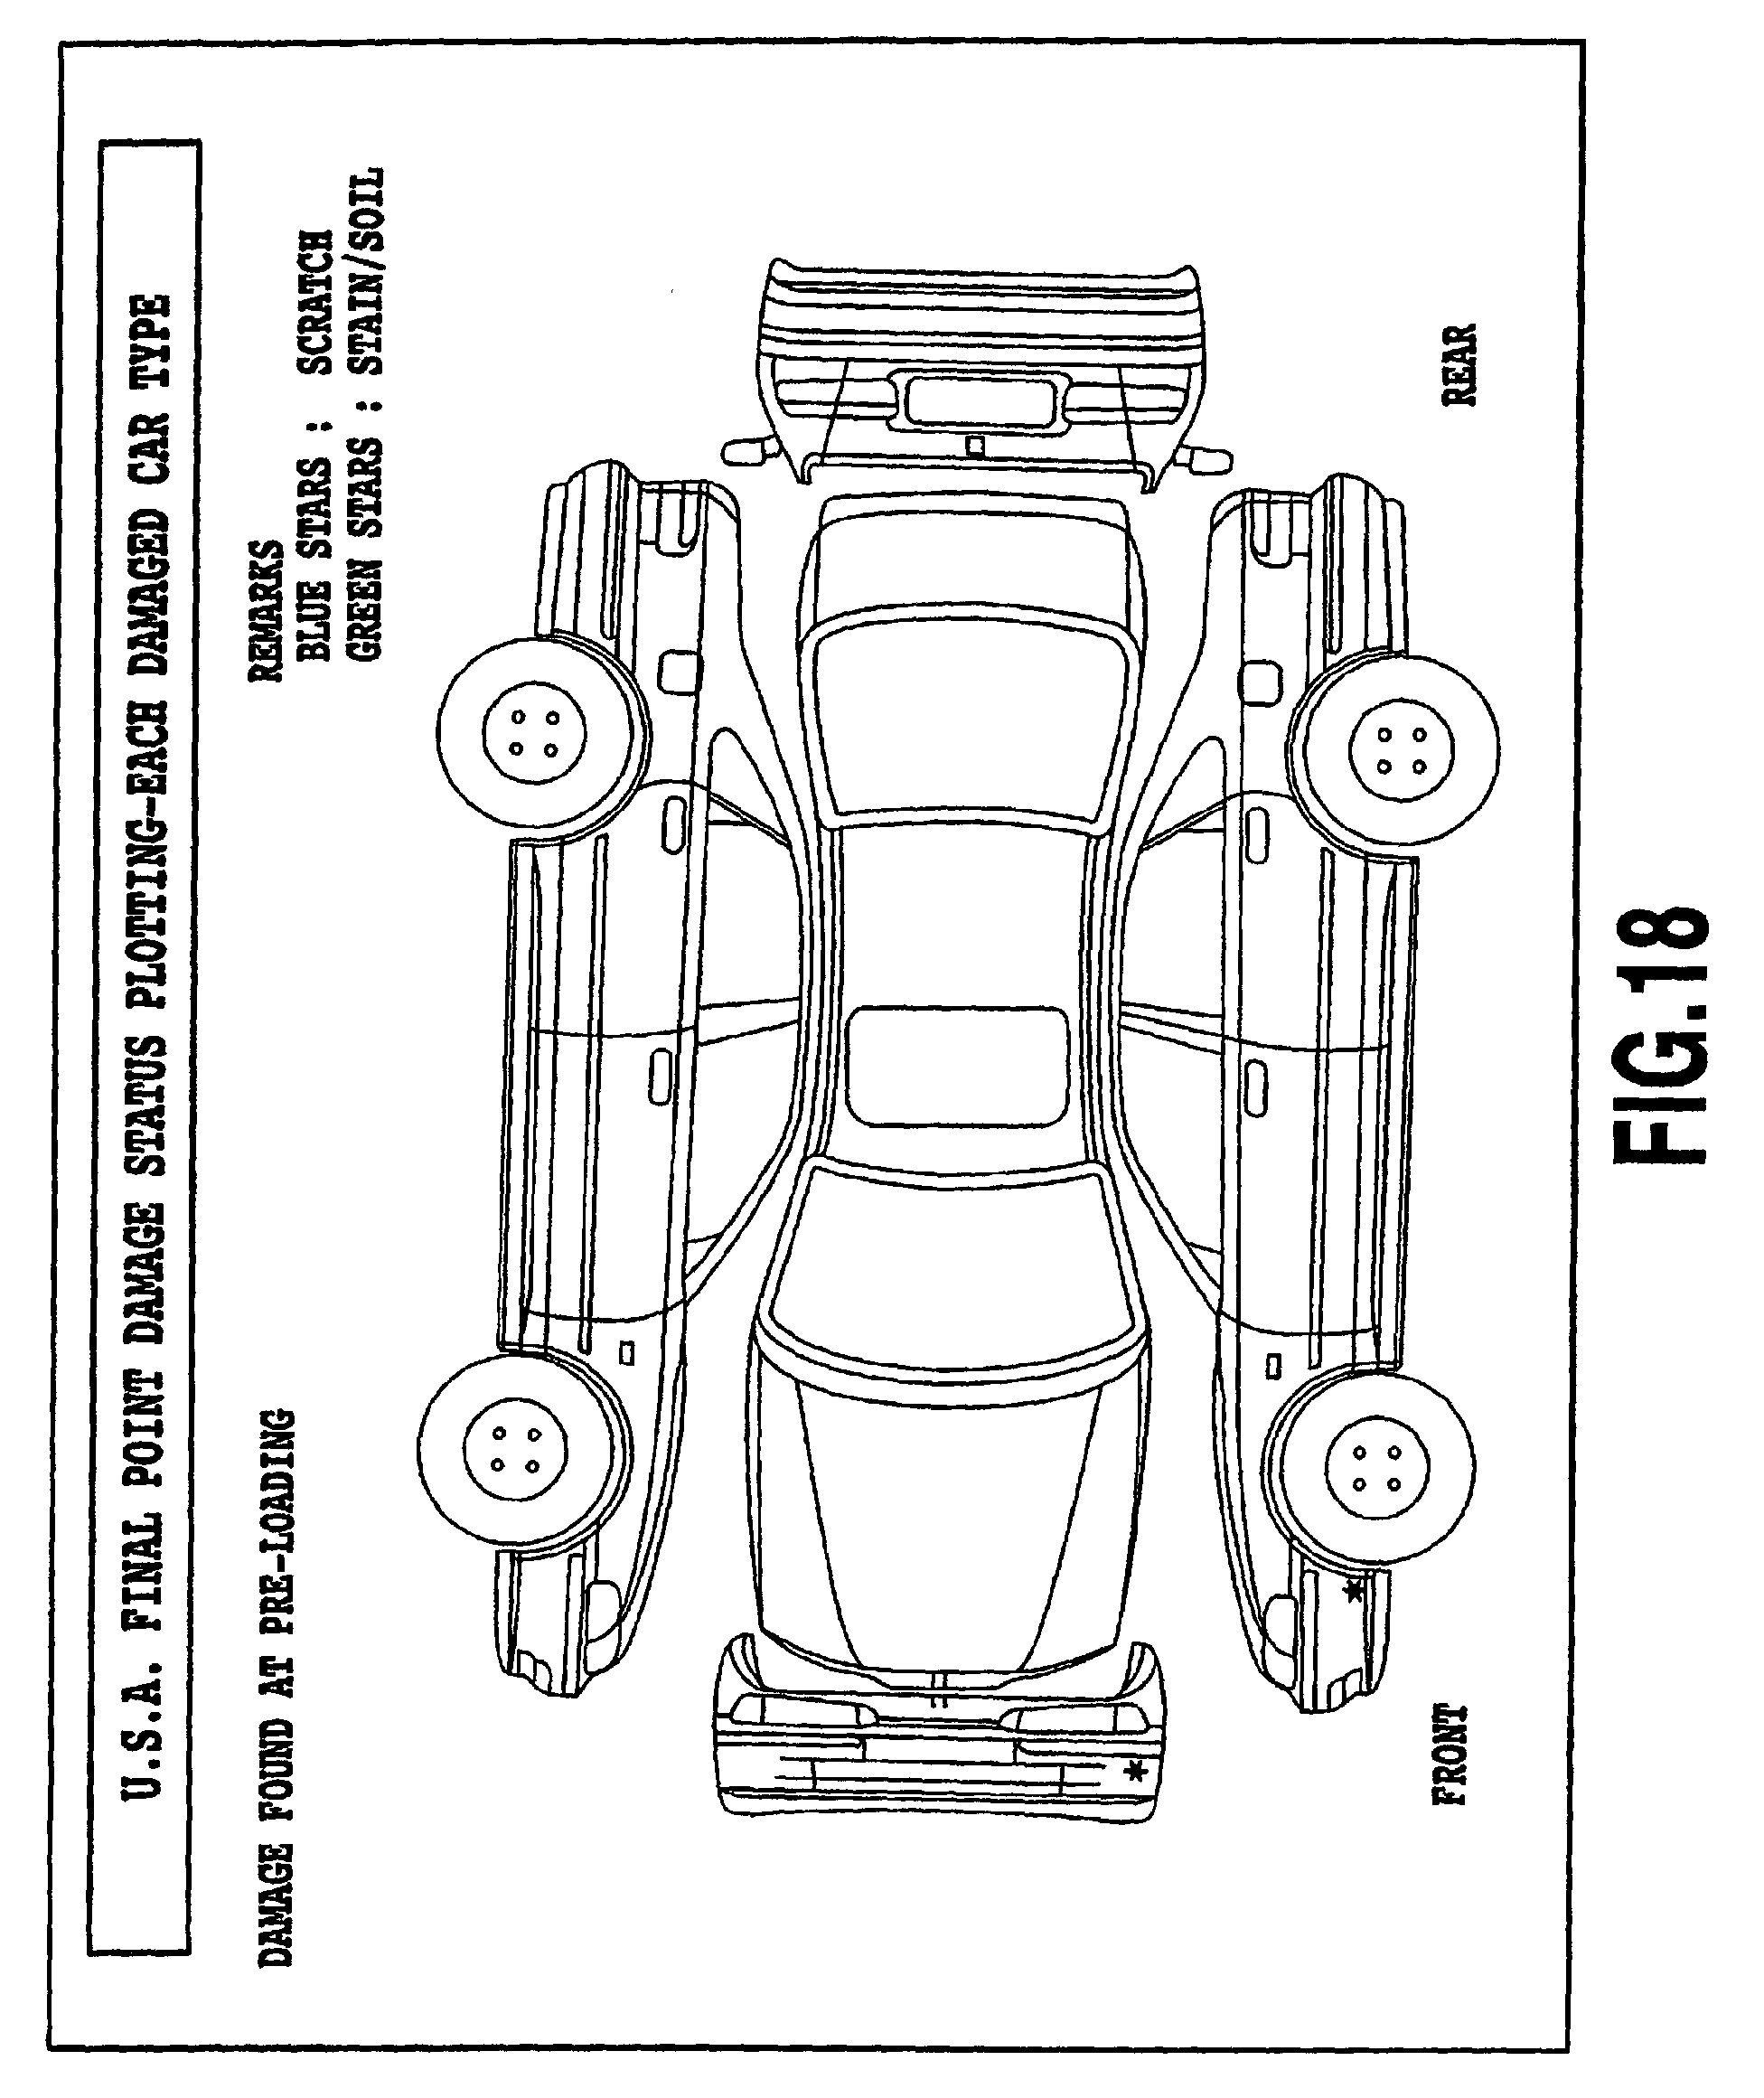 car damage inspection diagram 2001 toyota camry wiring vehicle suv imageresizertool com